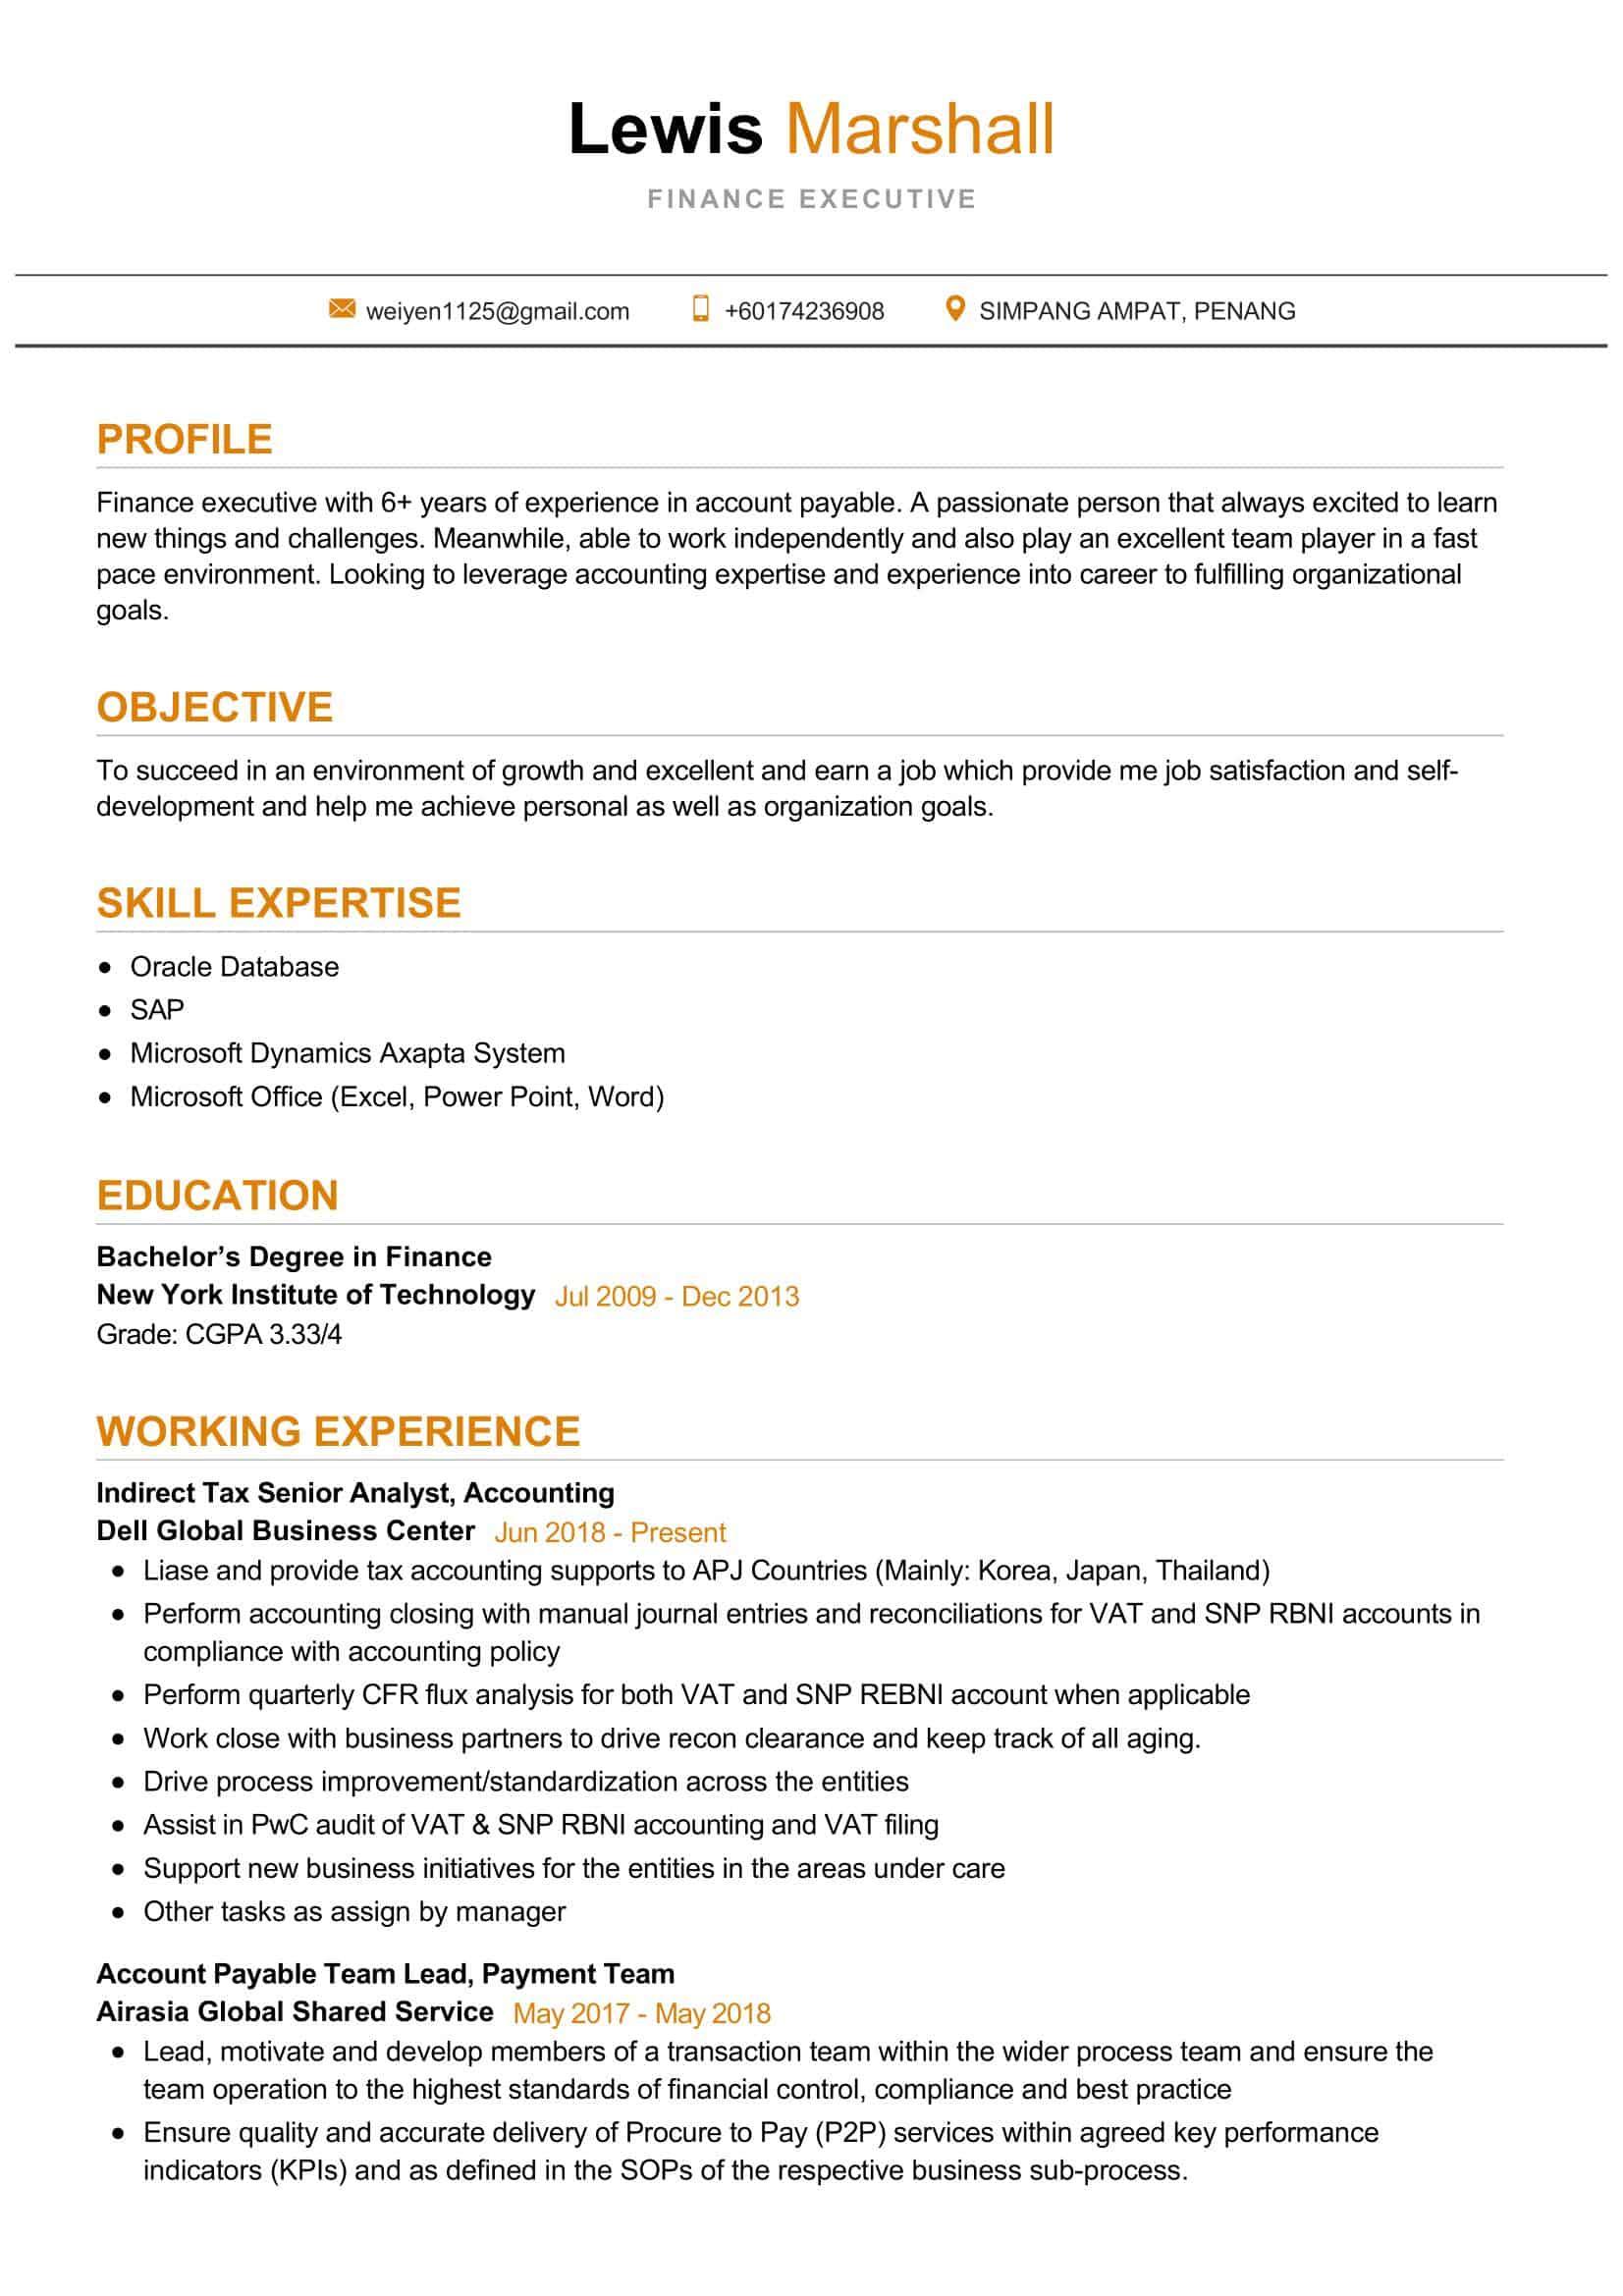 Finance Executive Resume Sample